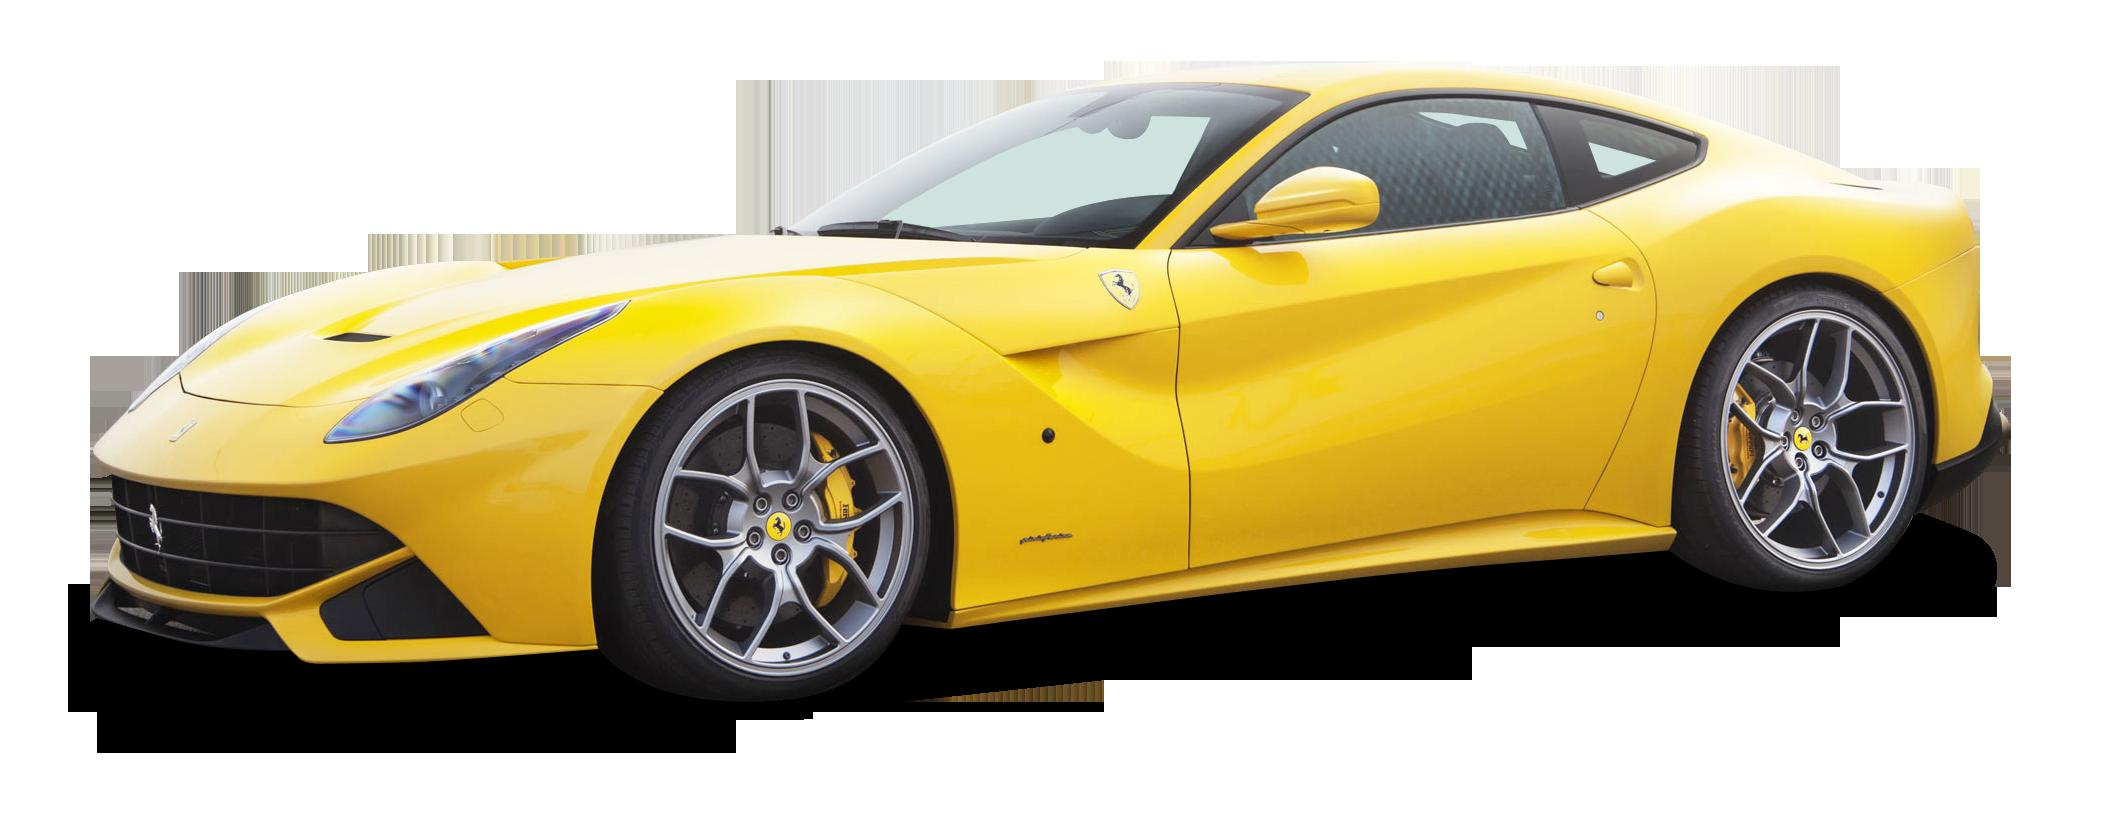 Yellow Ferrari F12berlinetta Car PNG Image